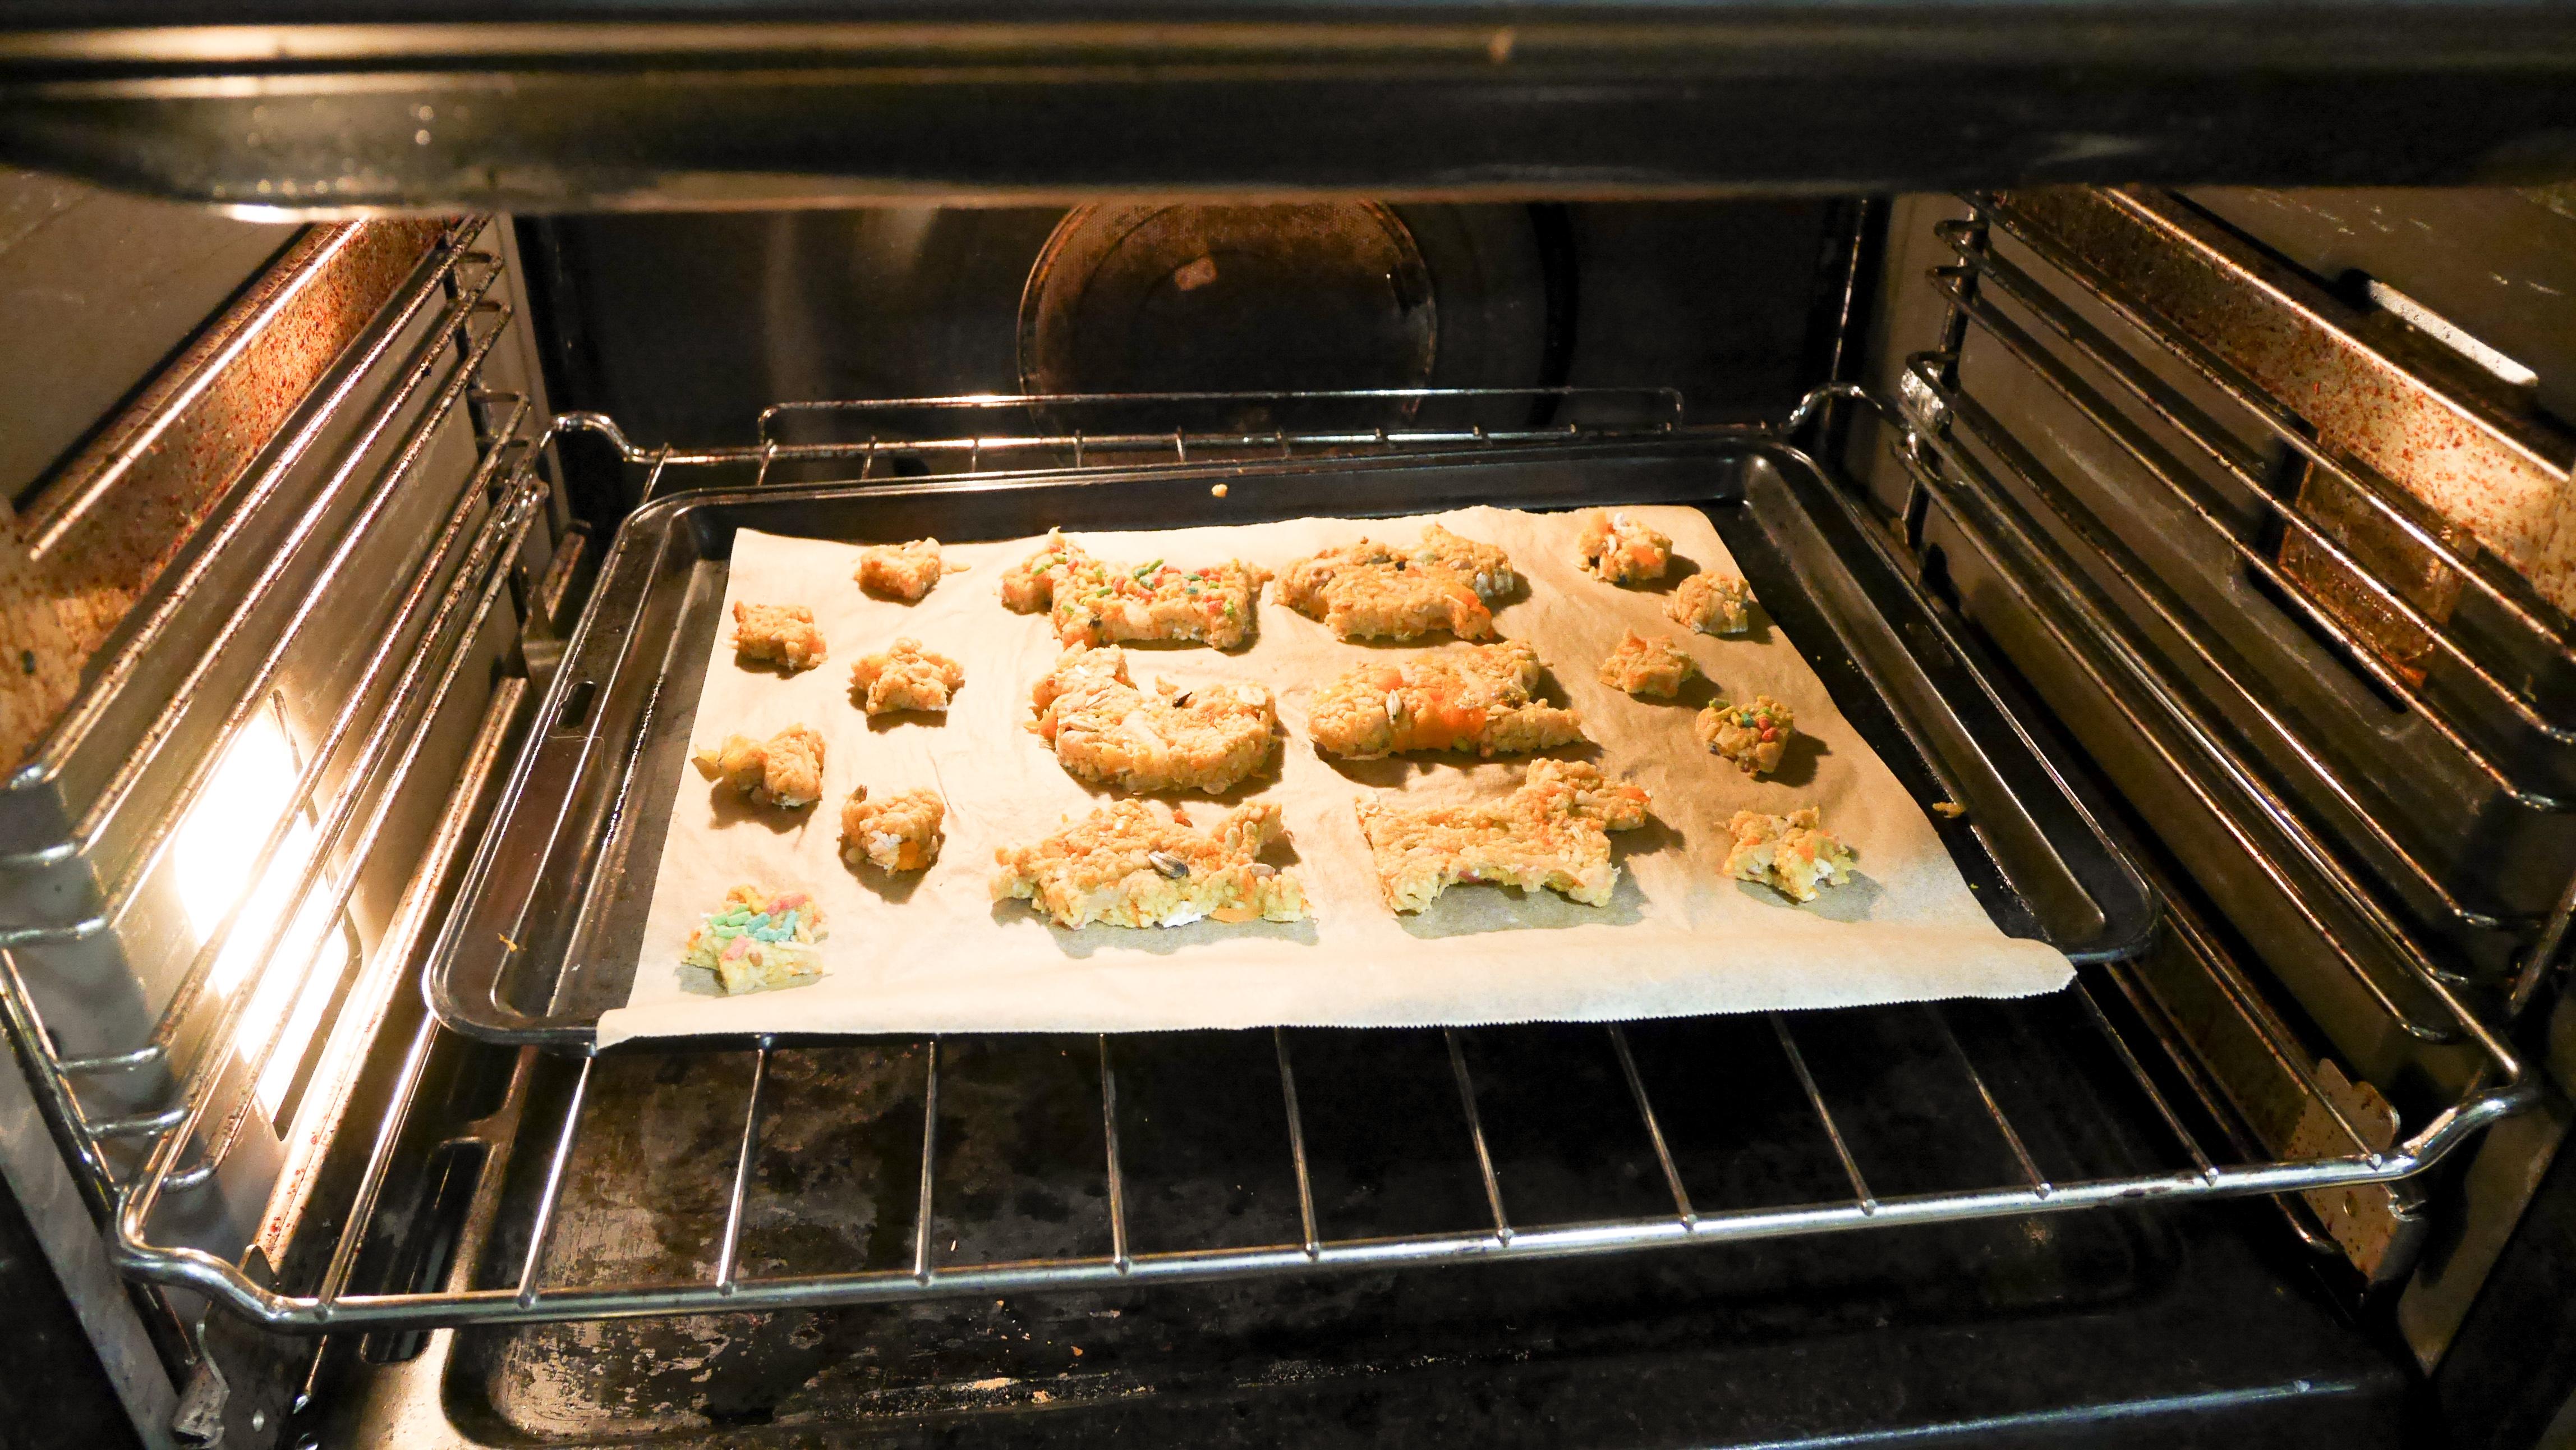 Parrot cookies baking in the oven